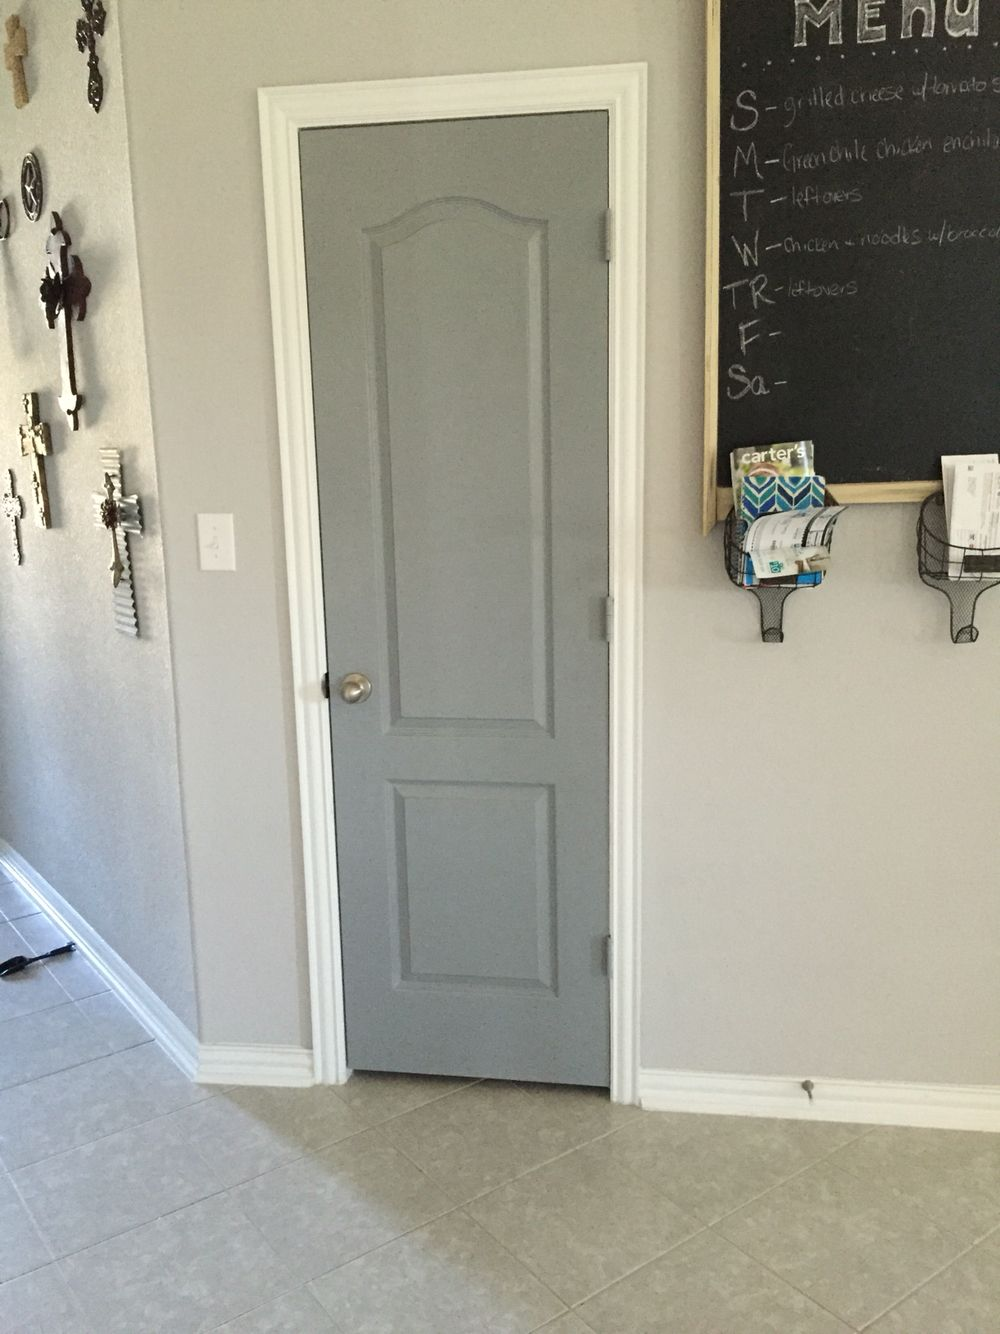 valspar stone mason gray to liven up interior doors. Black Bedroom Furniture Sets. Home Design Ideas